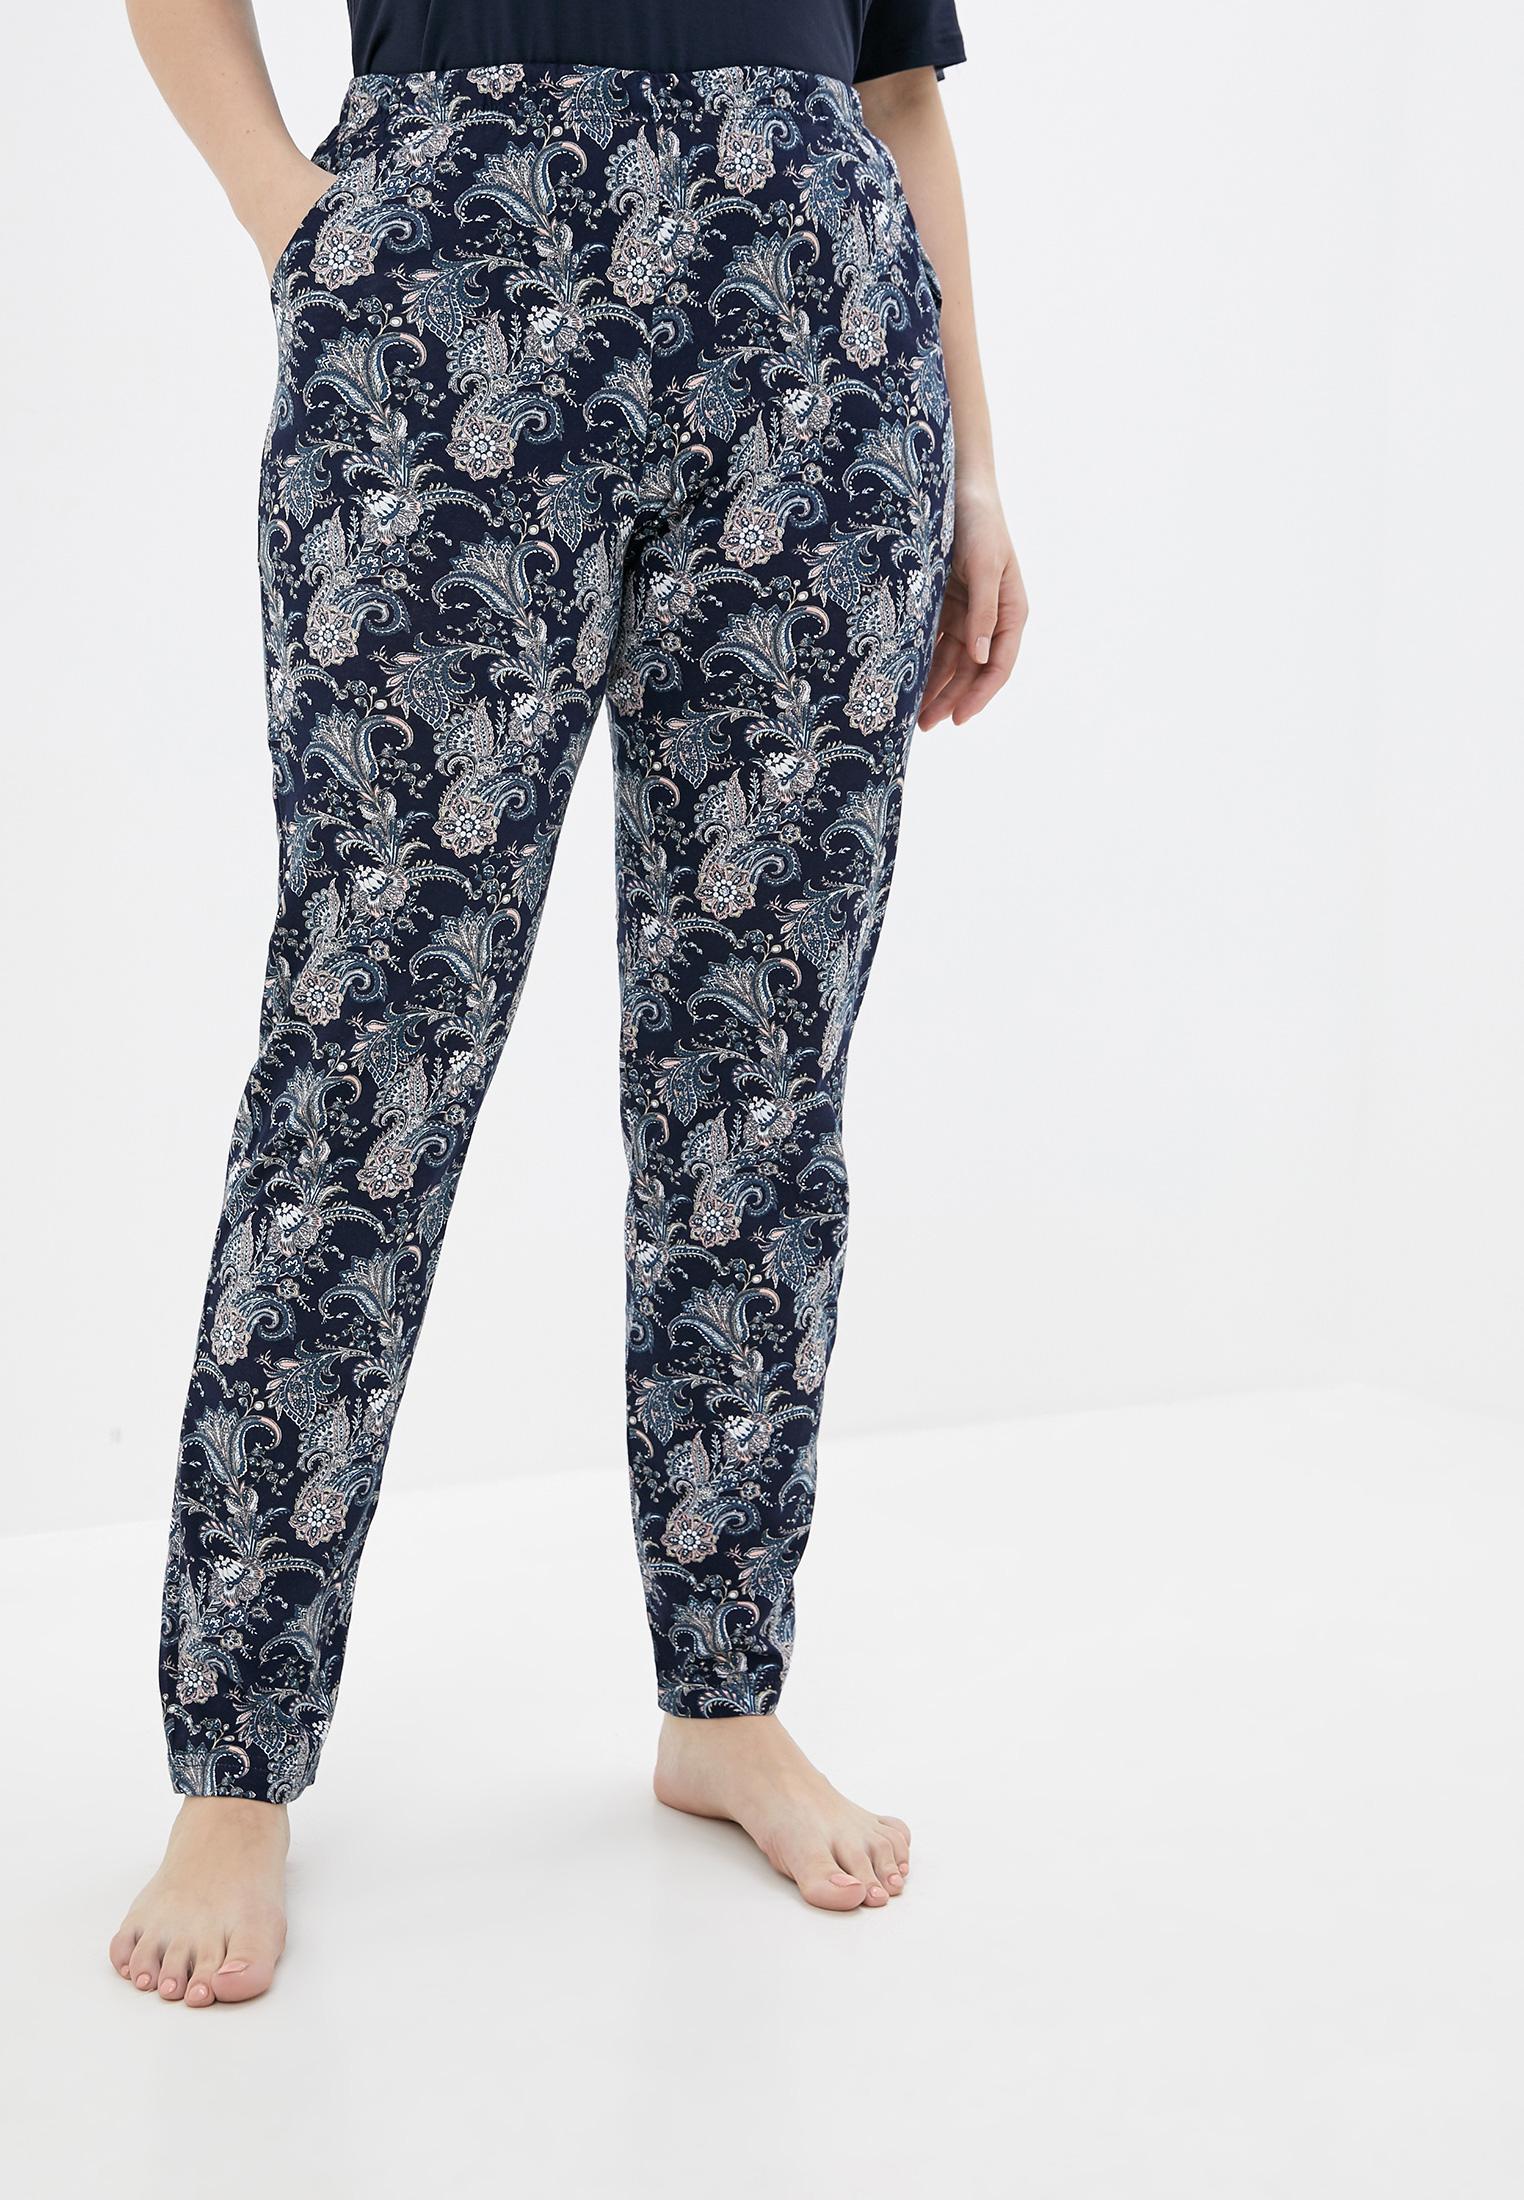 Женские домашние брюки Лори Б016-10